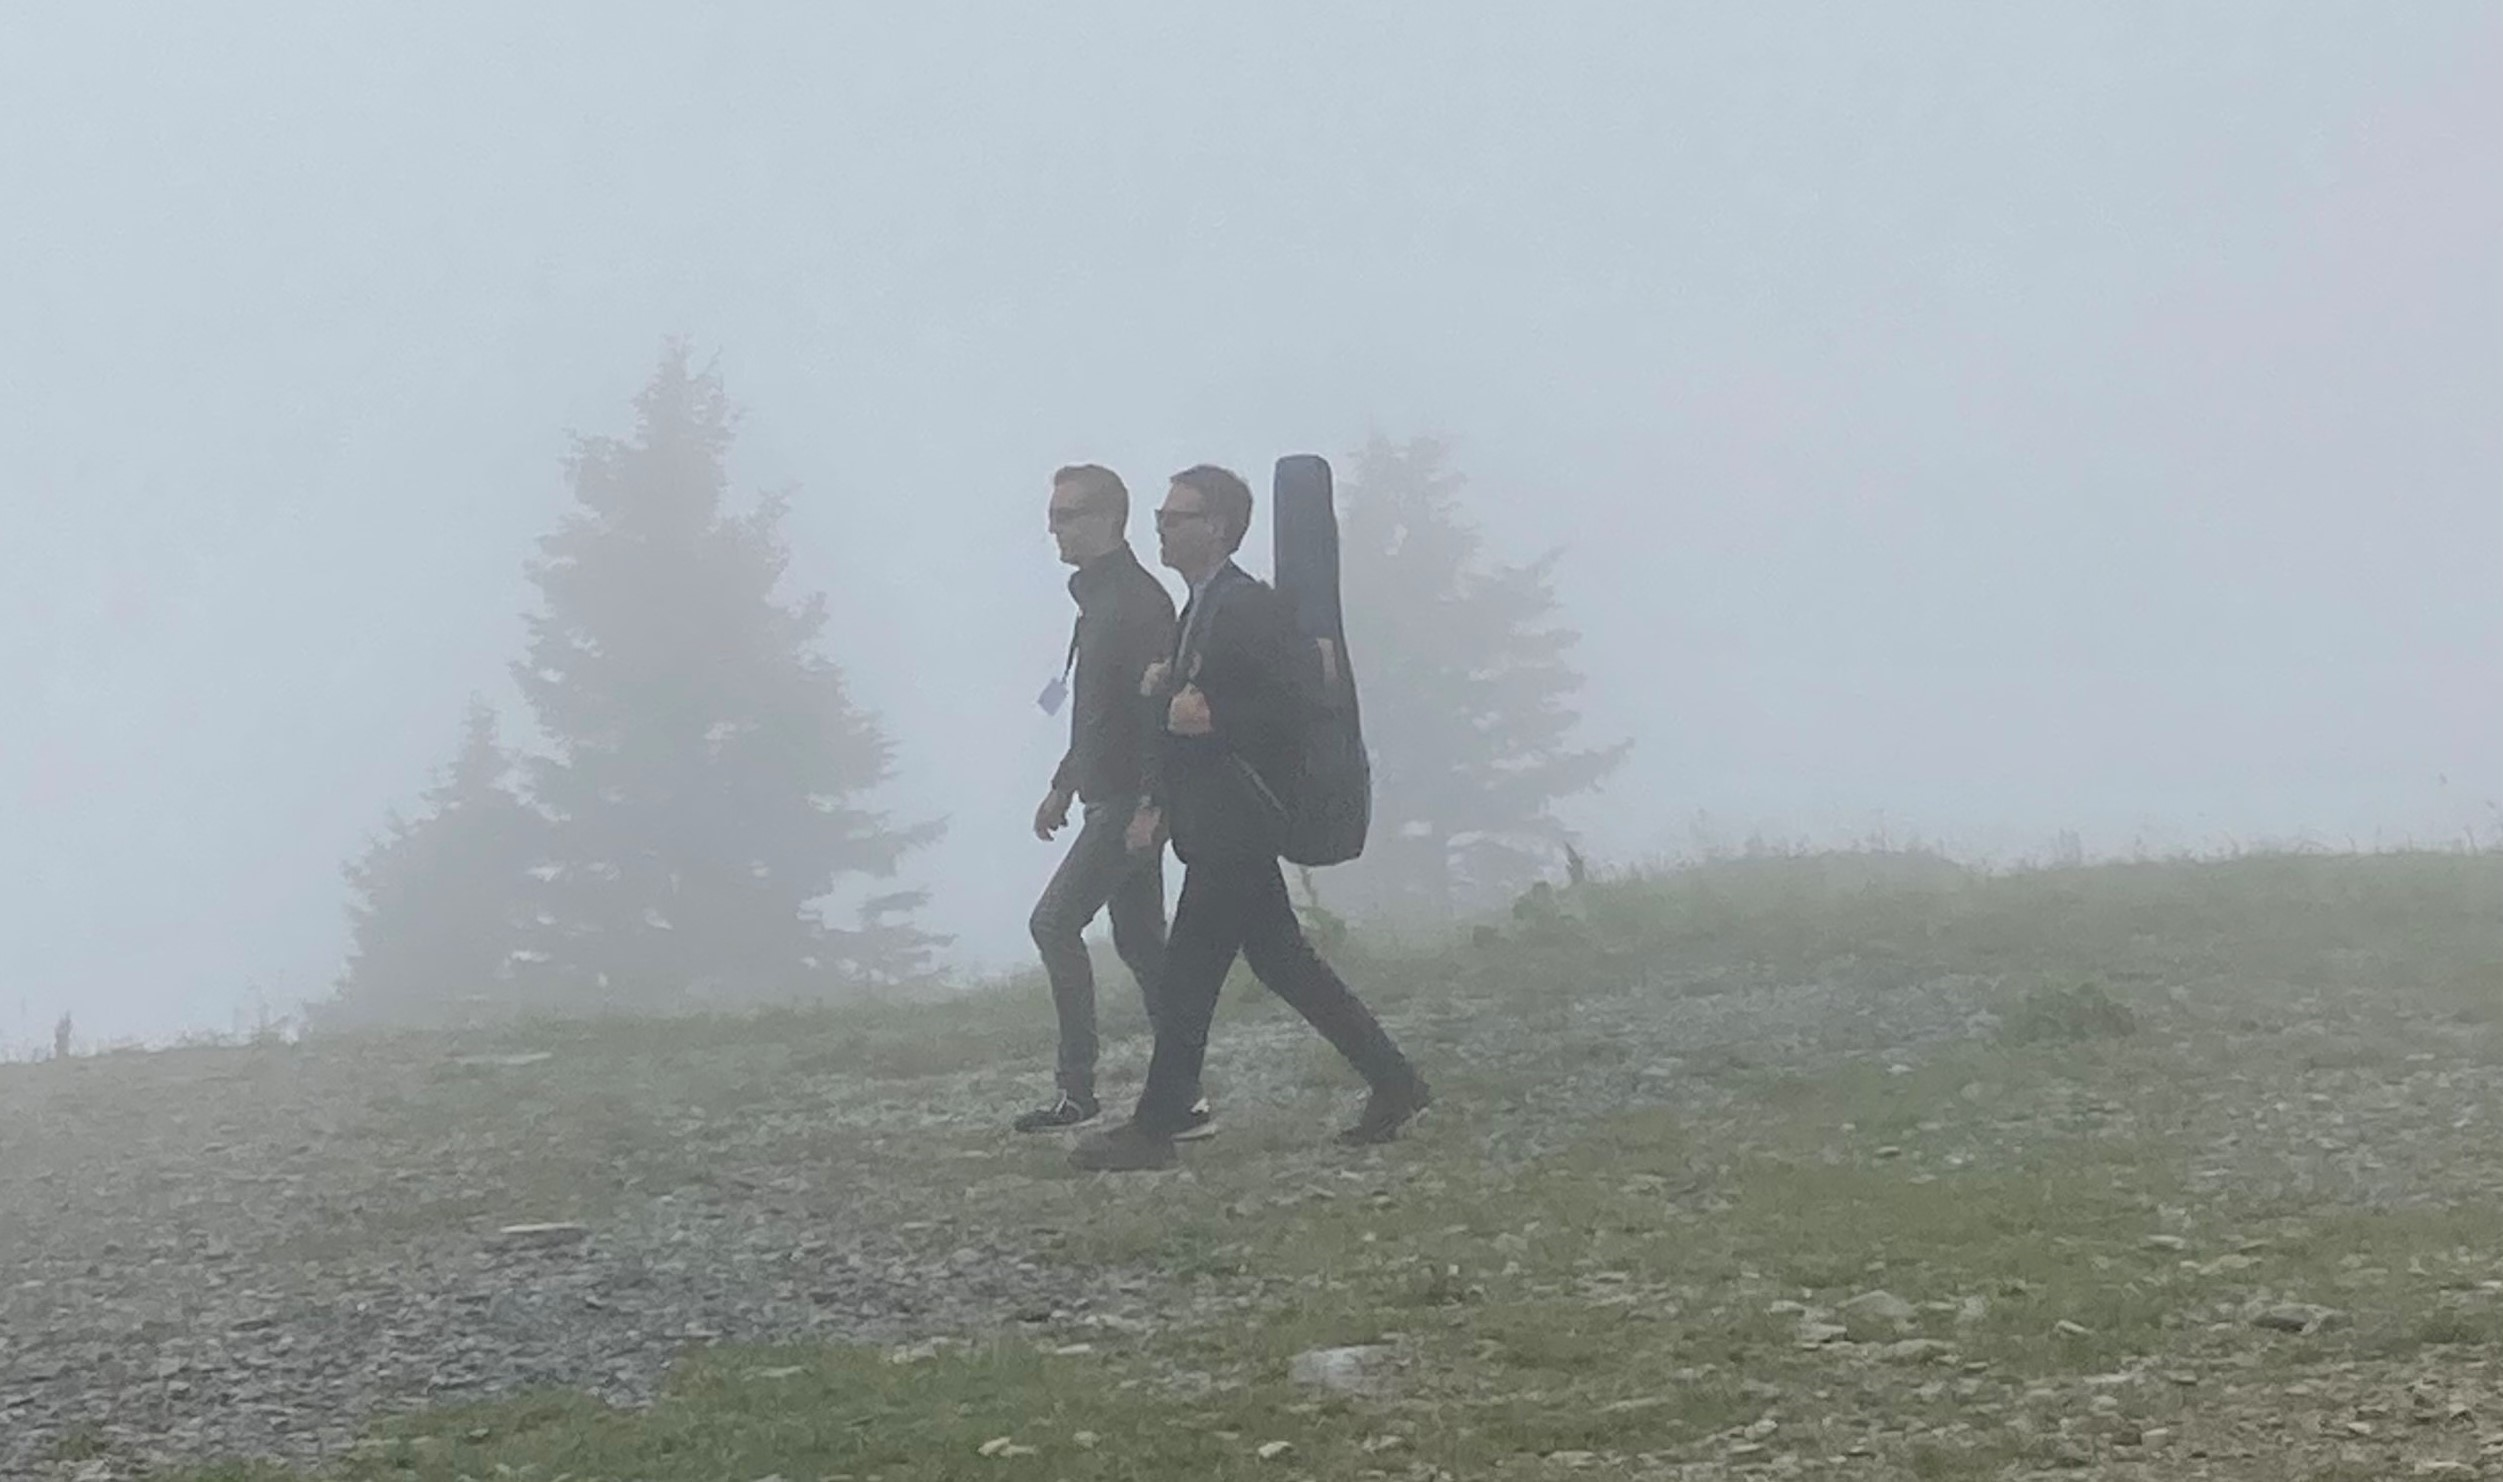 Piers Faccini émerge de la brume photo lucky skywalker